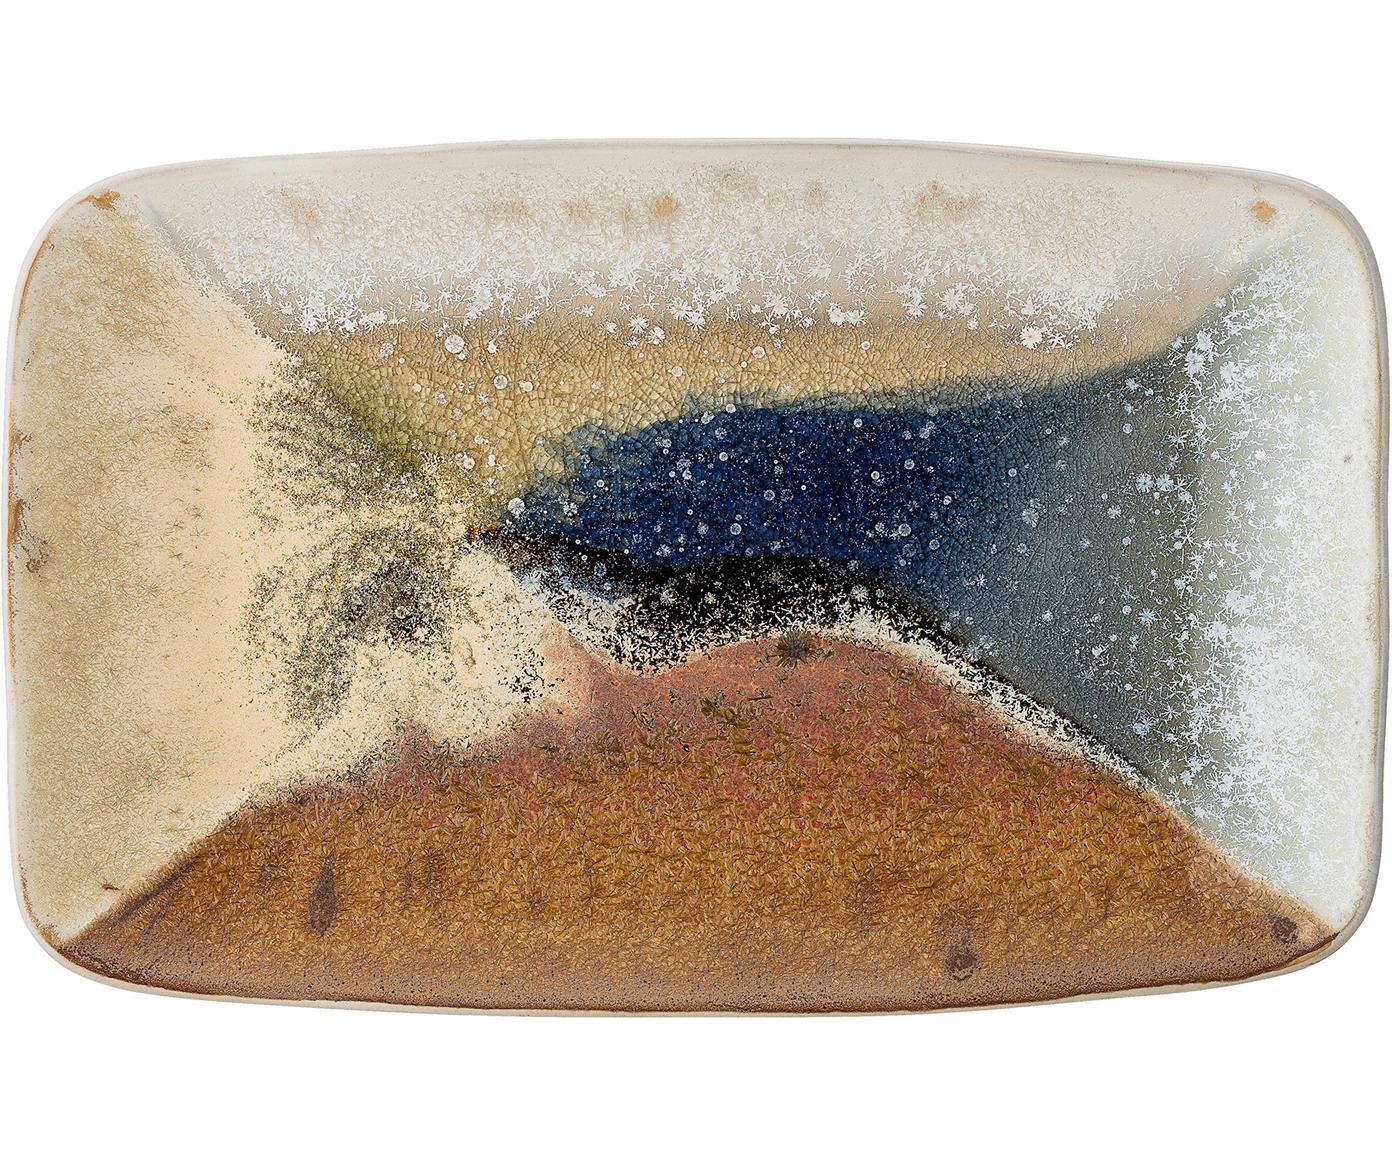 Handgemaakte serveerplateau Willow, Keramiek, Multicolour, B 34 x D 21 cm